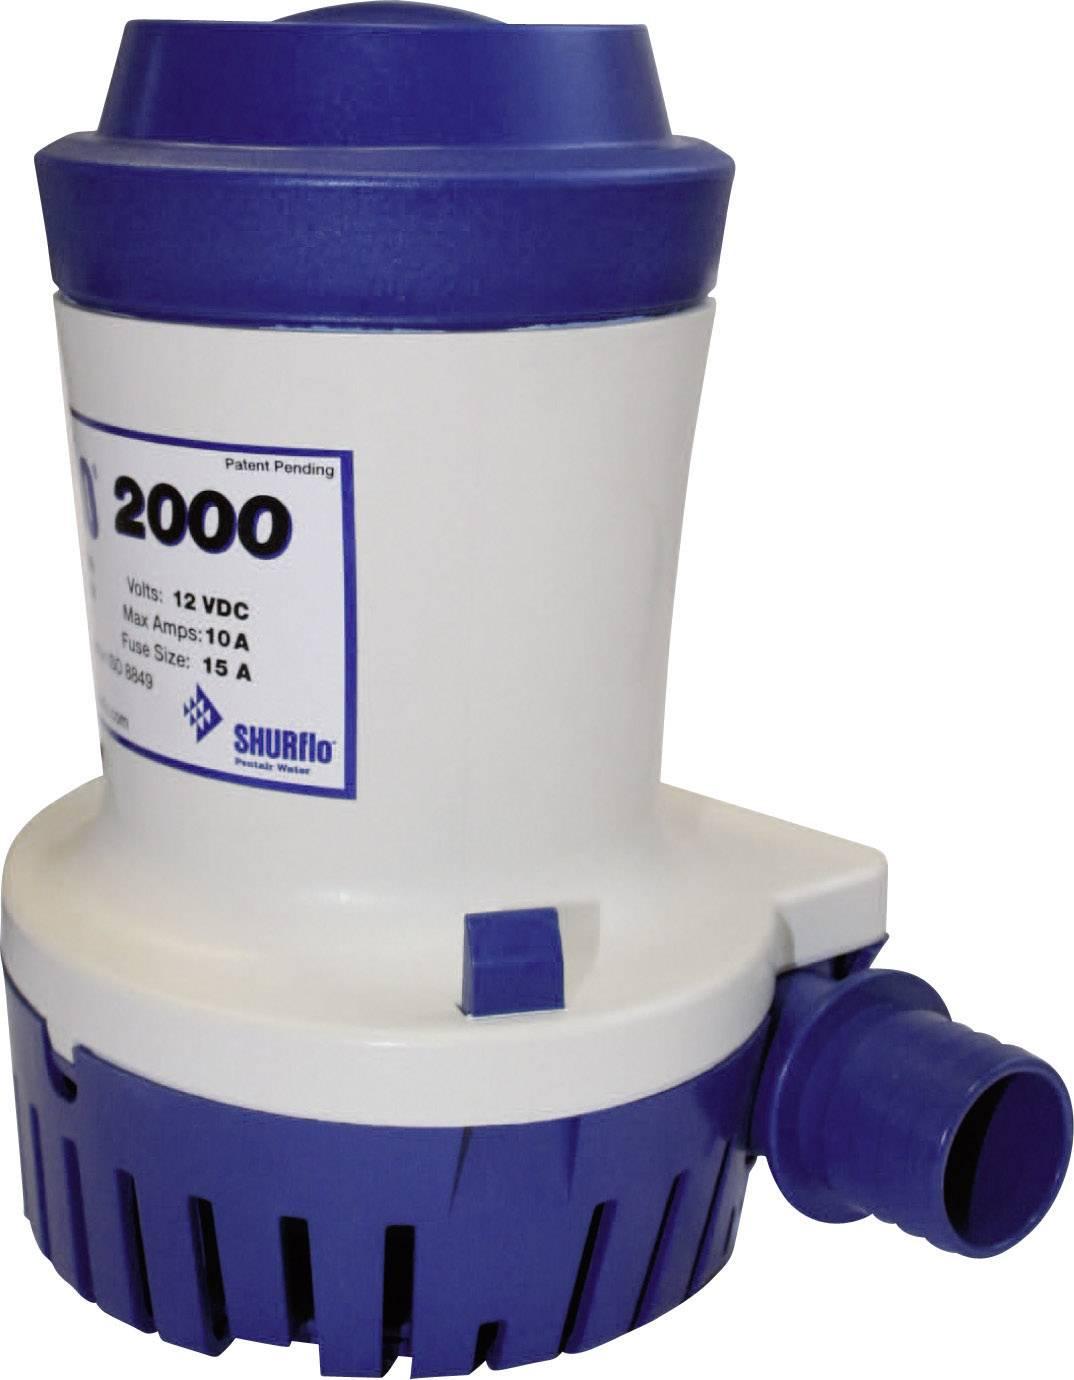 Lodné čerpadlo SHURflo 2000, 12 V